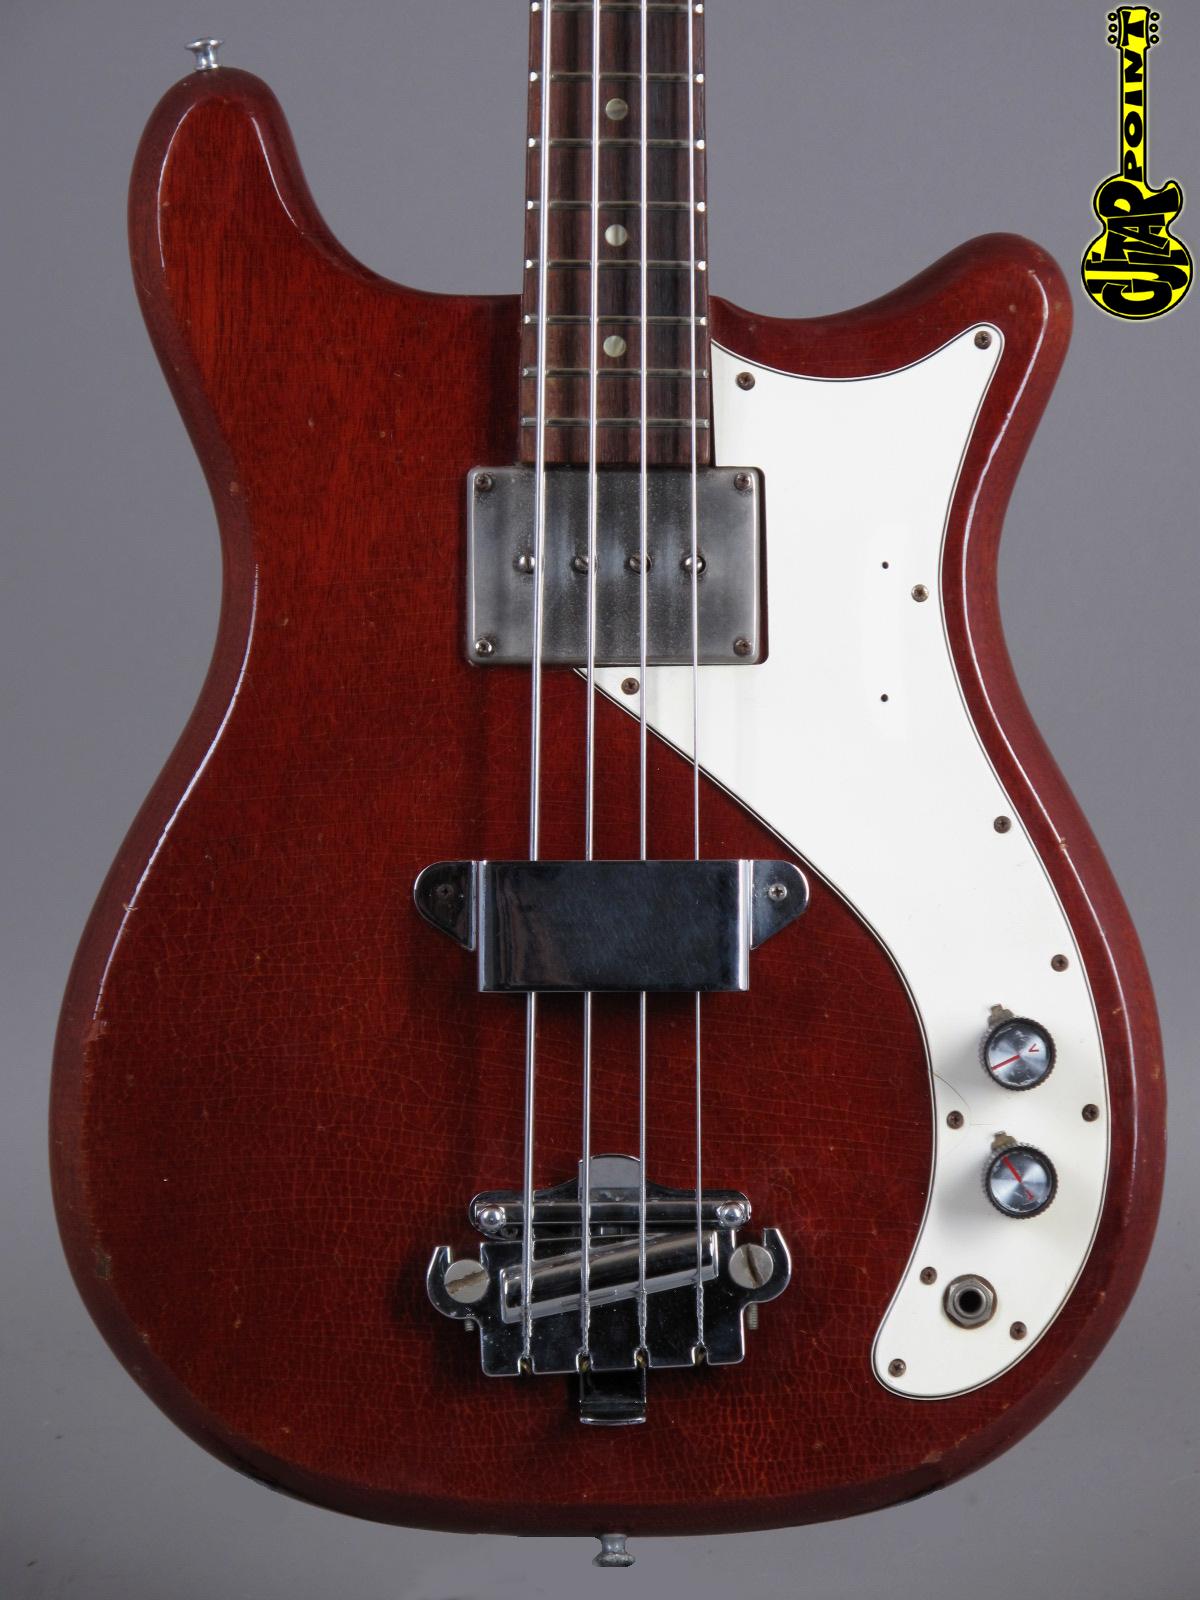 1965 Epiphone Newport Bass Cherry